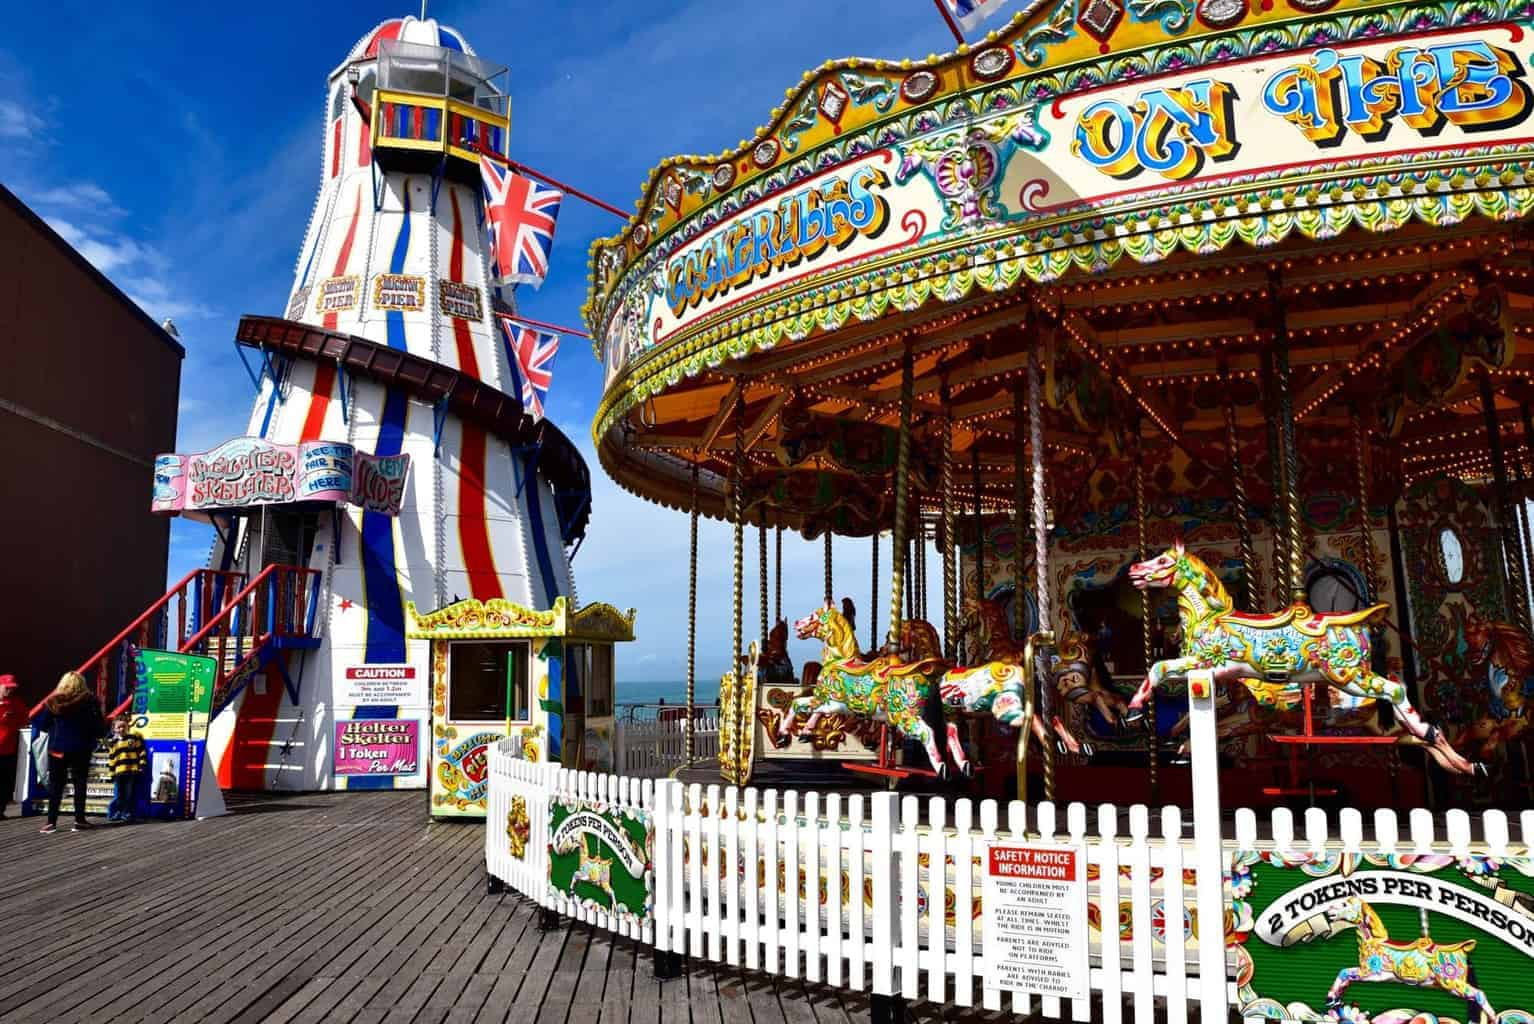 Brighton Pier Carousel